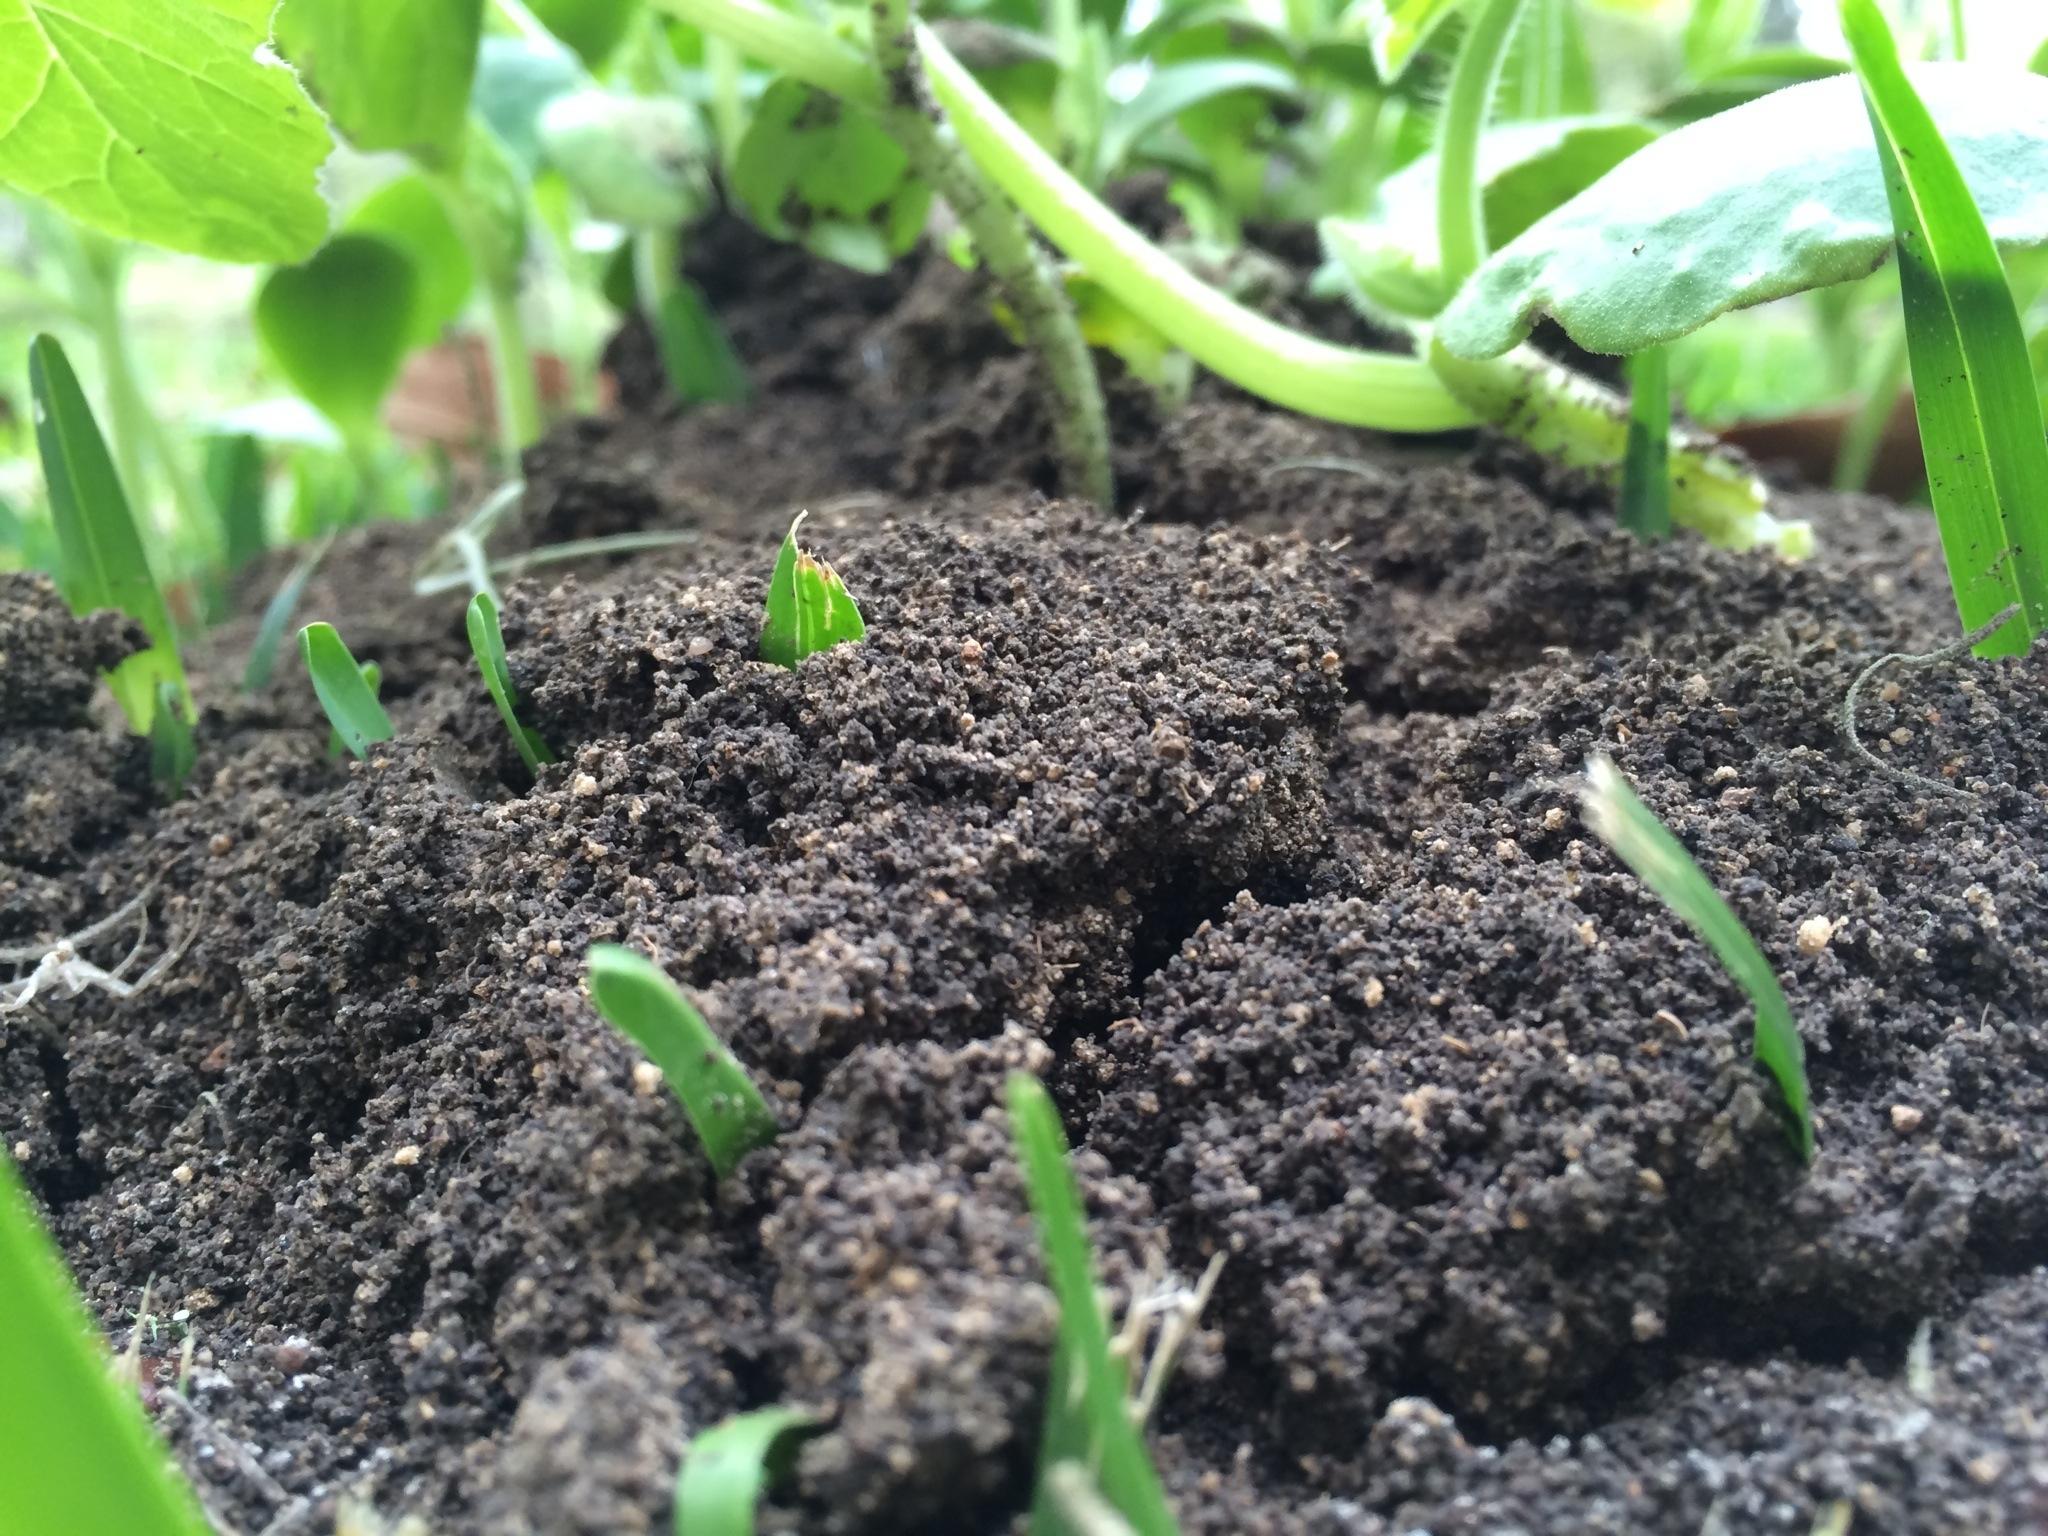 Gardenwise: Nurture the Ground Beneath Your Feet — The Importance of Healthy Soil